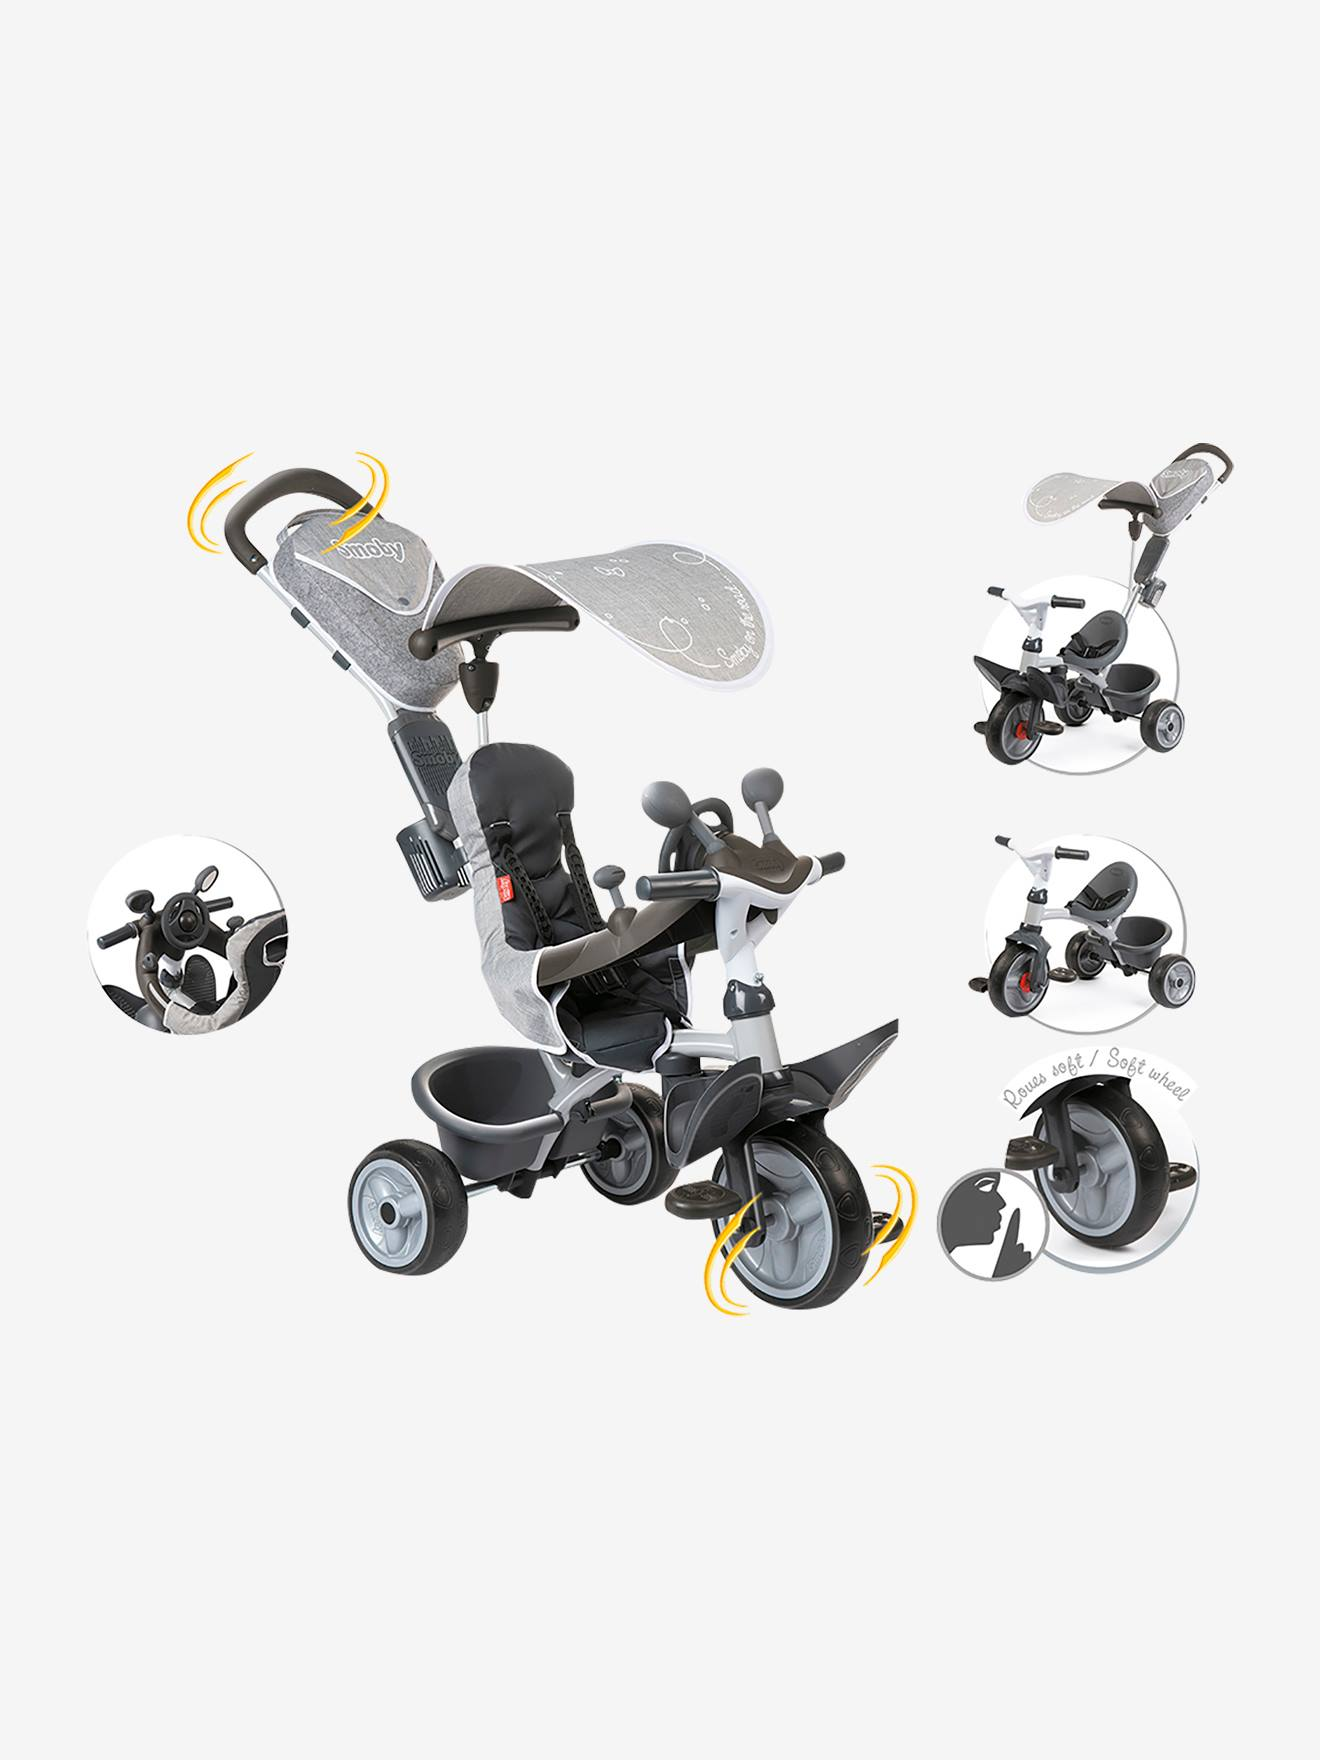 Triciclo Baby Driver Confort, da SMOBY cinzento medio liso